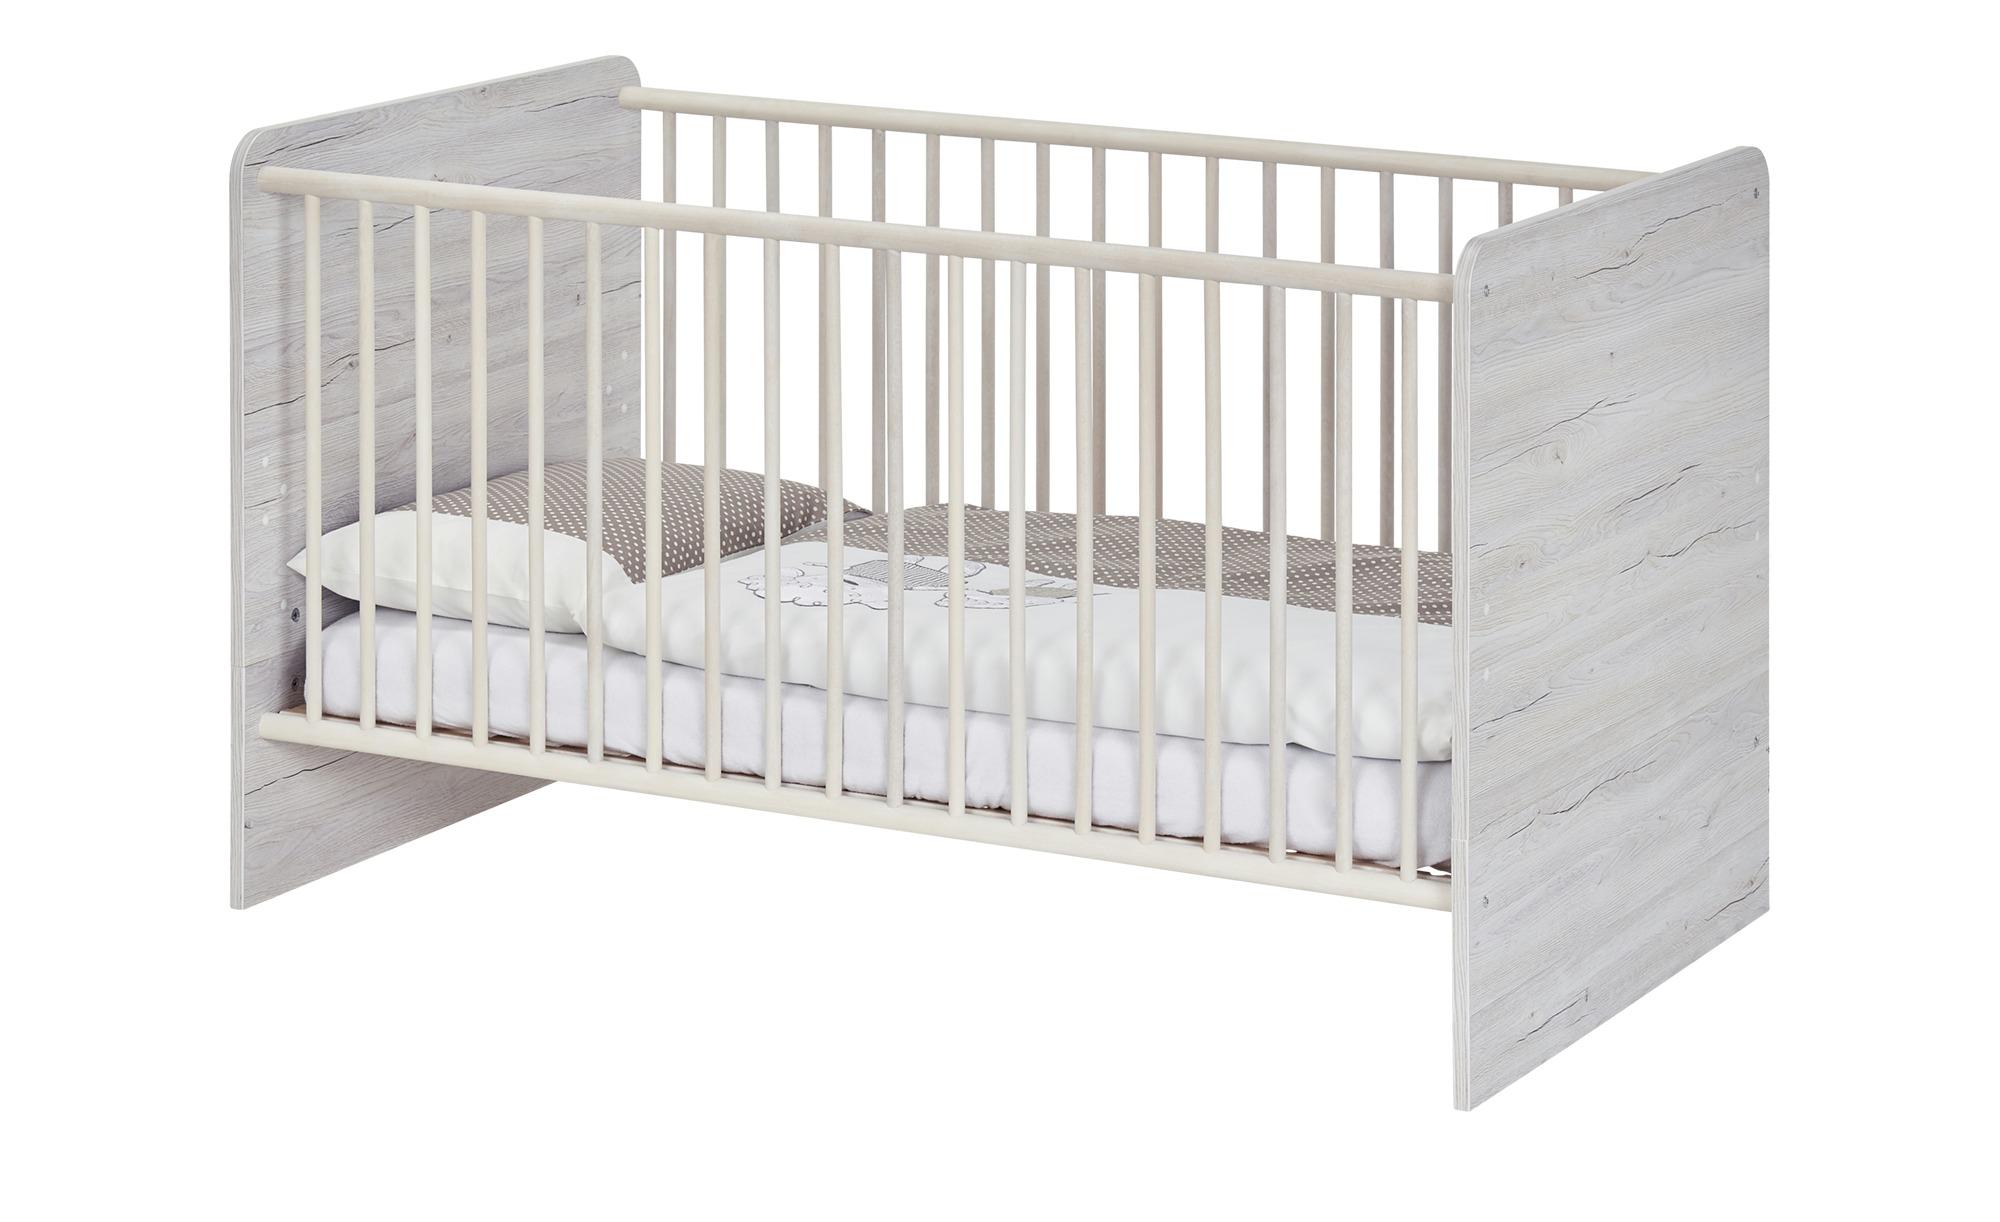 Kinderbett 70x140 grau Nick ¦ holzfarben ¦ Maße (cm): B: 74 H: 77 T: 150 Baby > Babymöbel > Babybetten - Höffner | Kinderzimmer > Kinderbetten > Kinderbetten | Holzfarben | Möbel Höffner DE